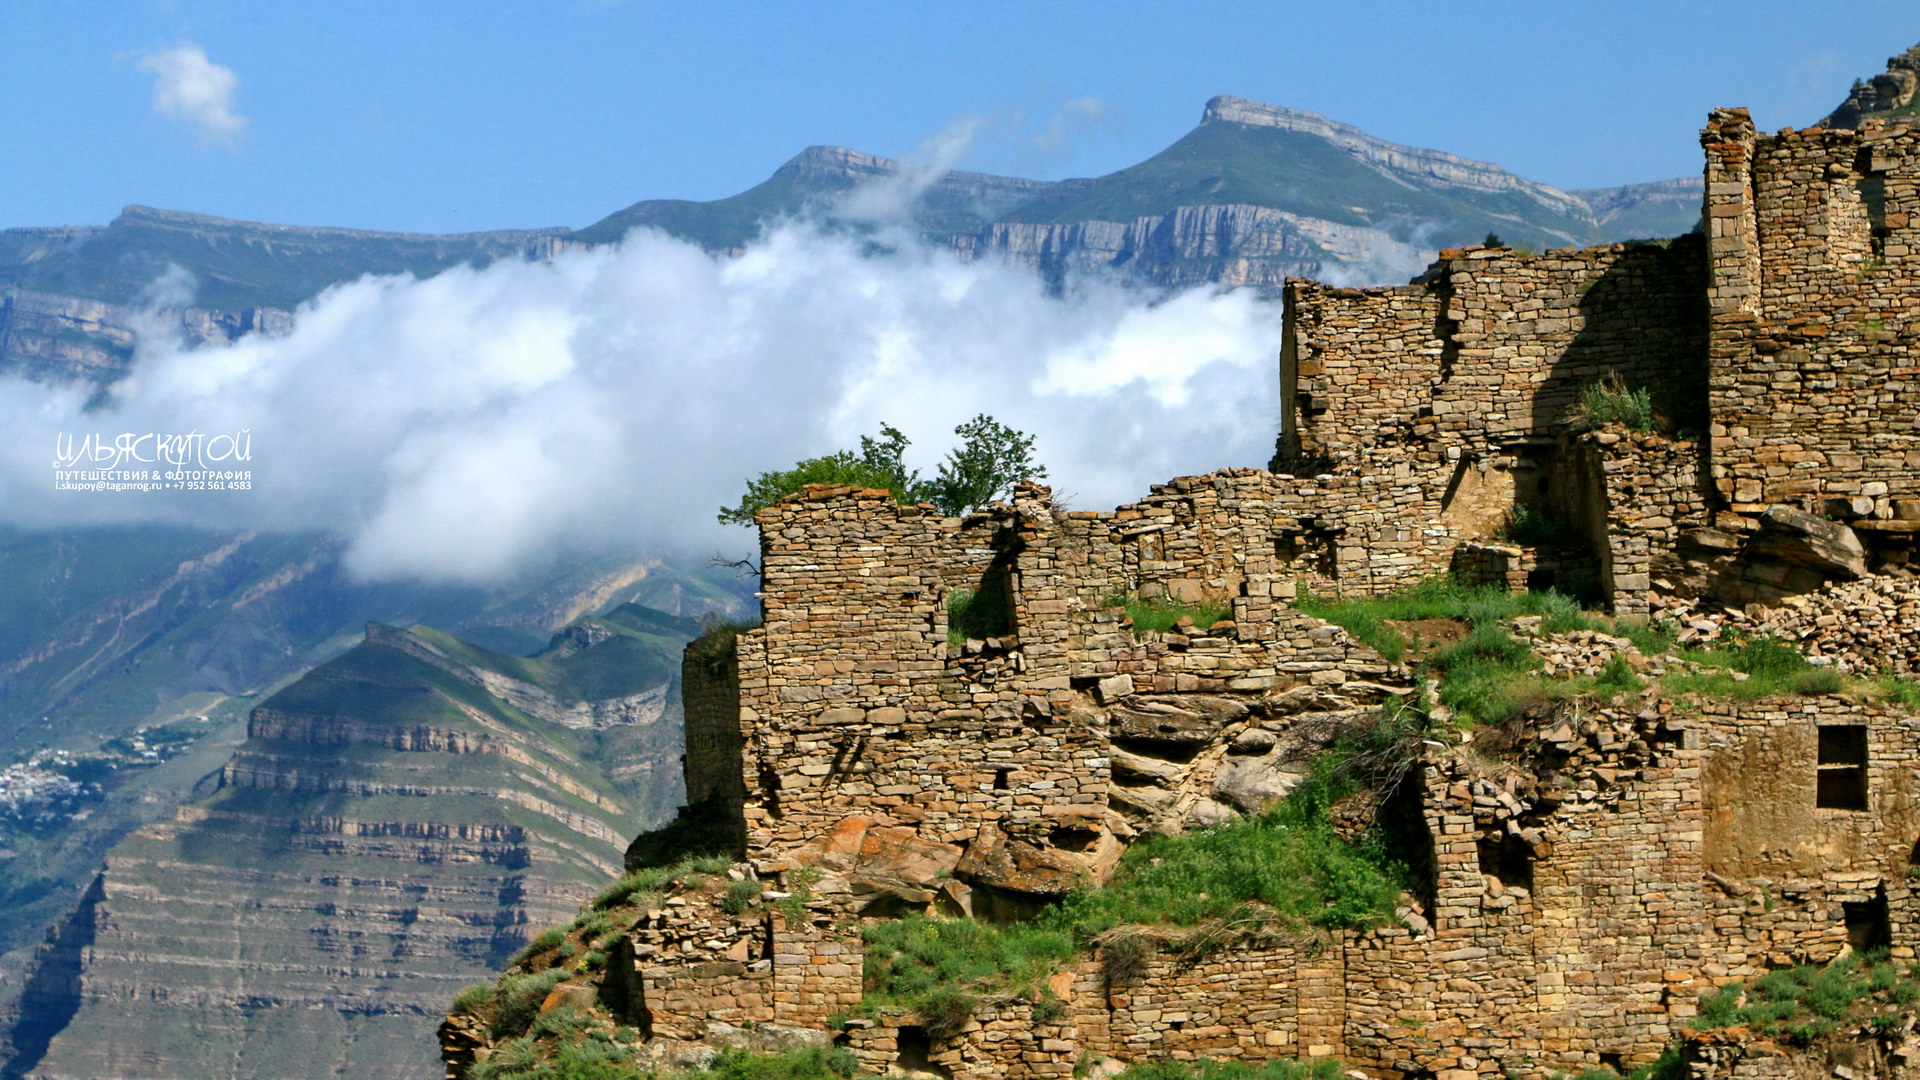 http://ws.pp.ru/foto/200123.Dagestan1.1920x1080.05.JPG